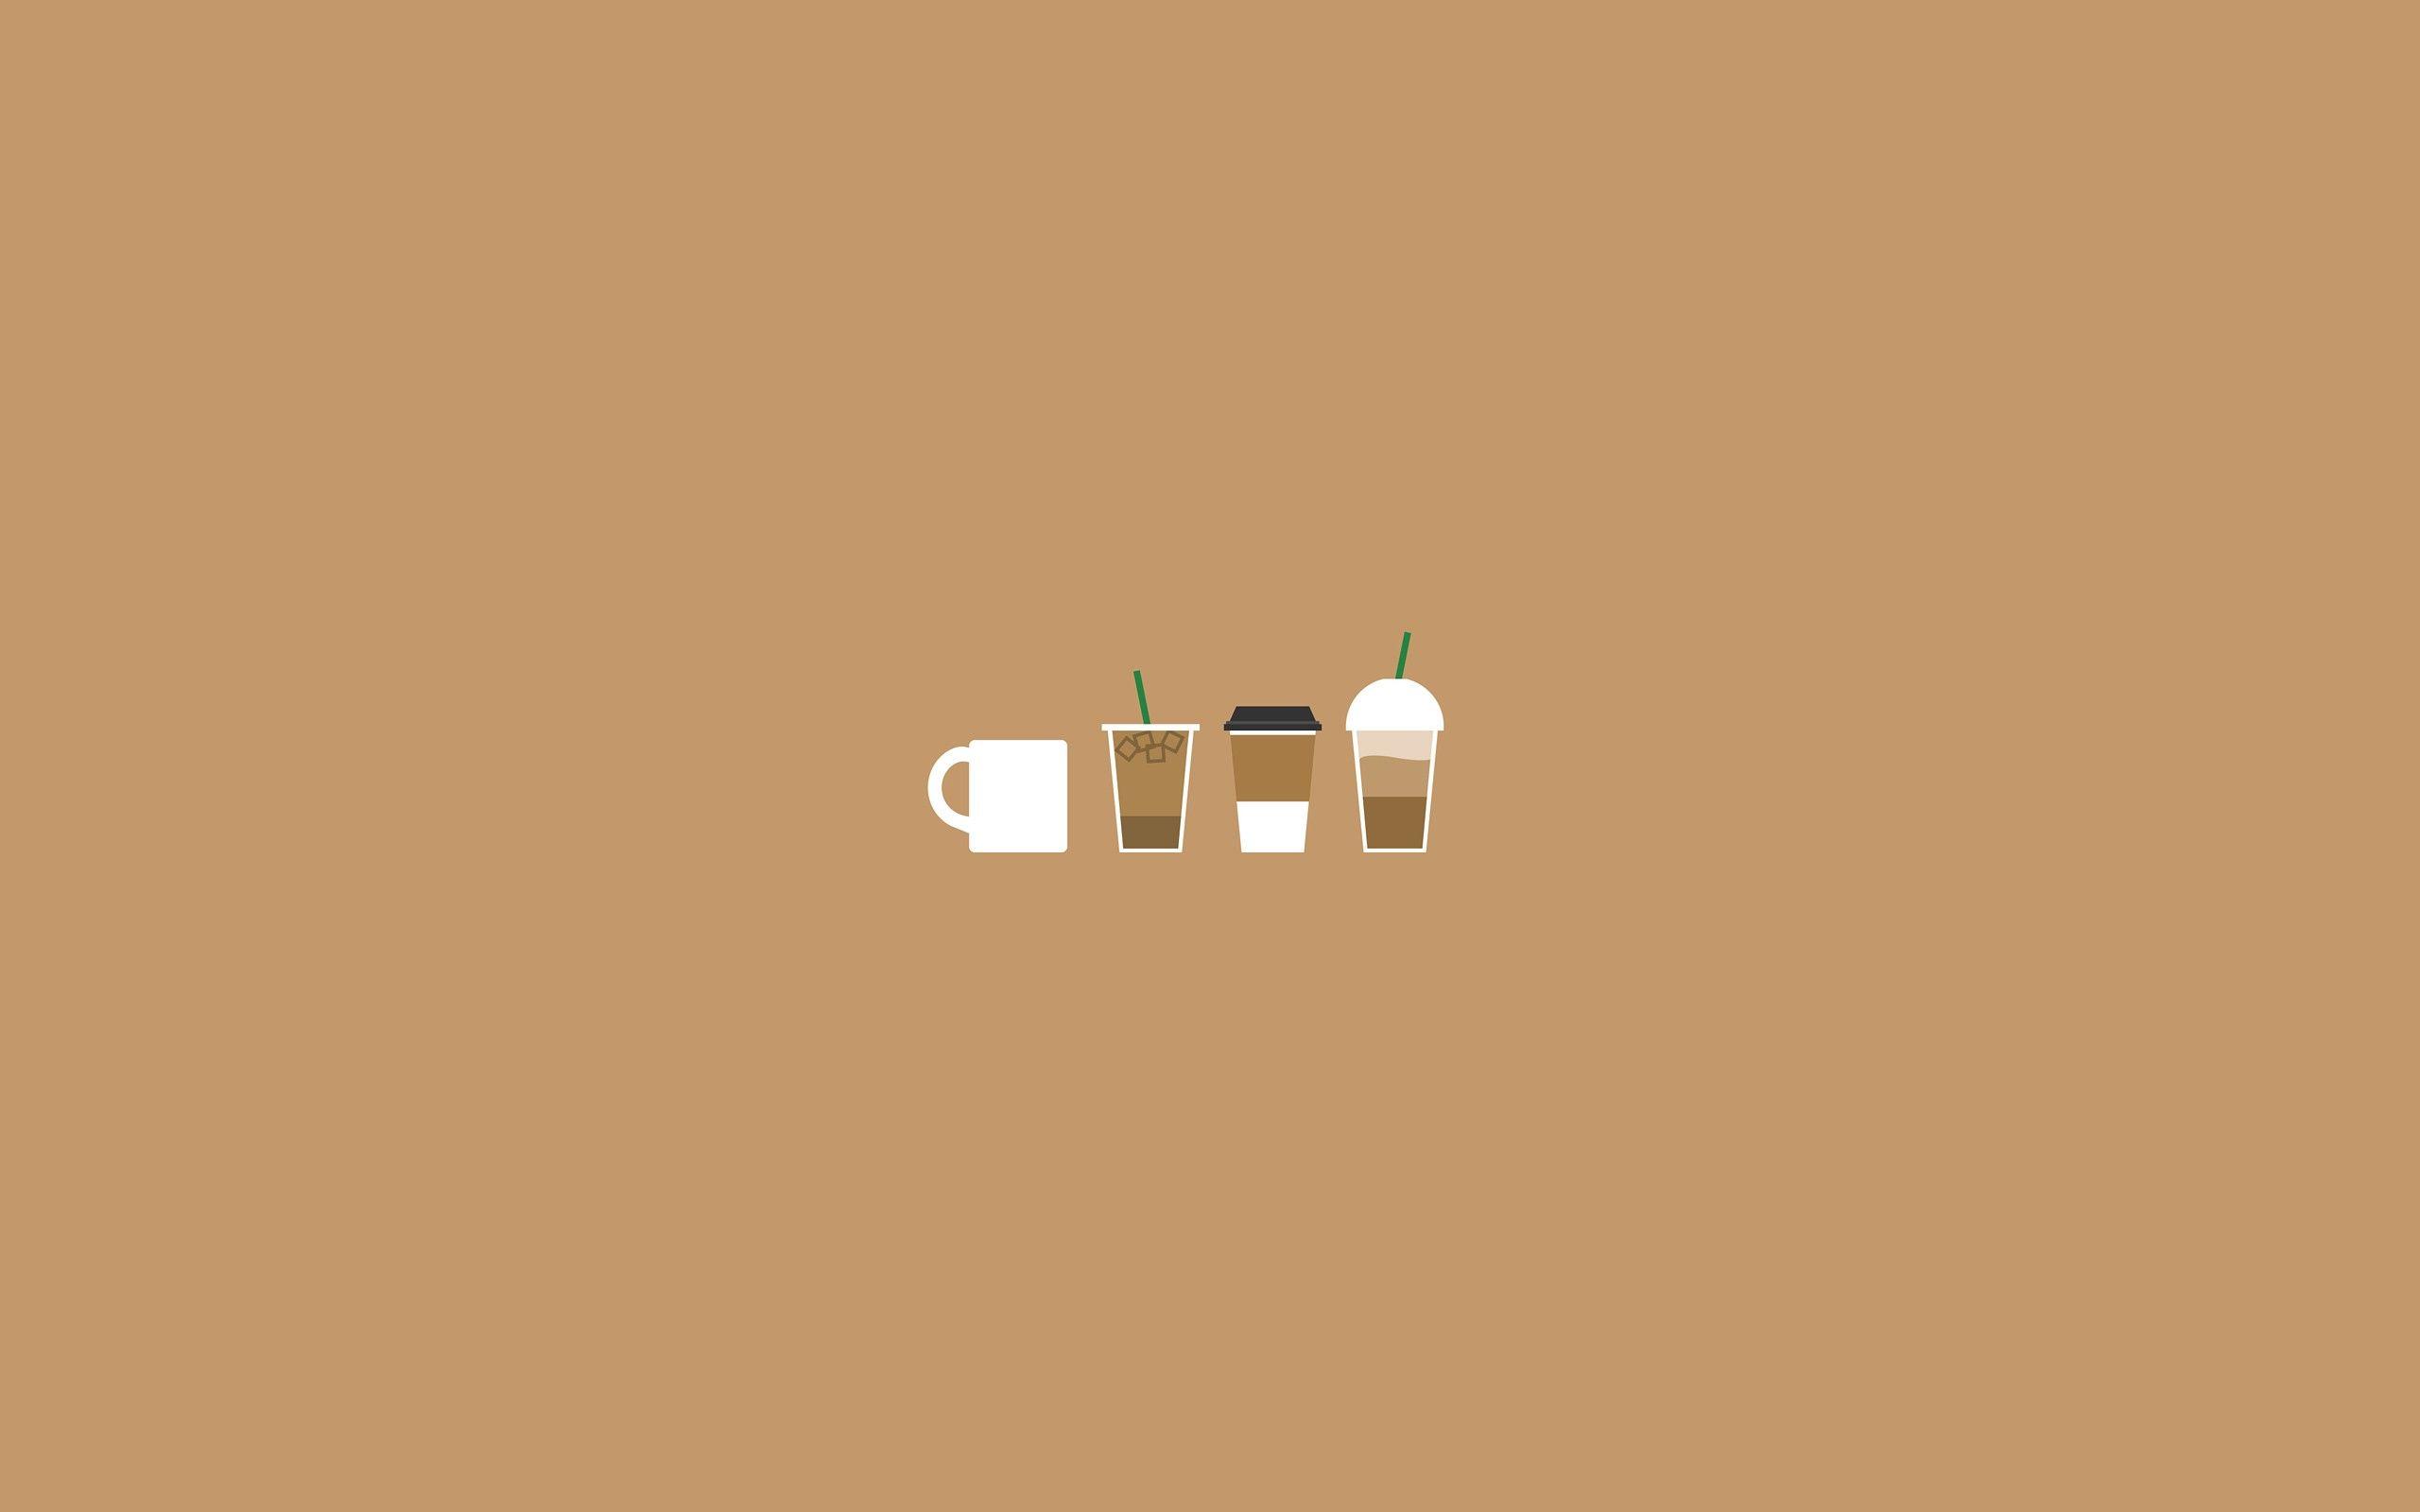 Coffee Illustration Aesthetic desktop wallpaper Minimalist 2560x1600